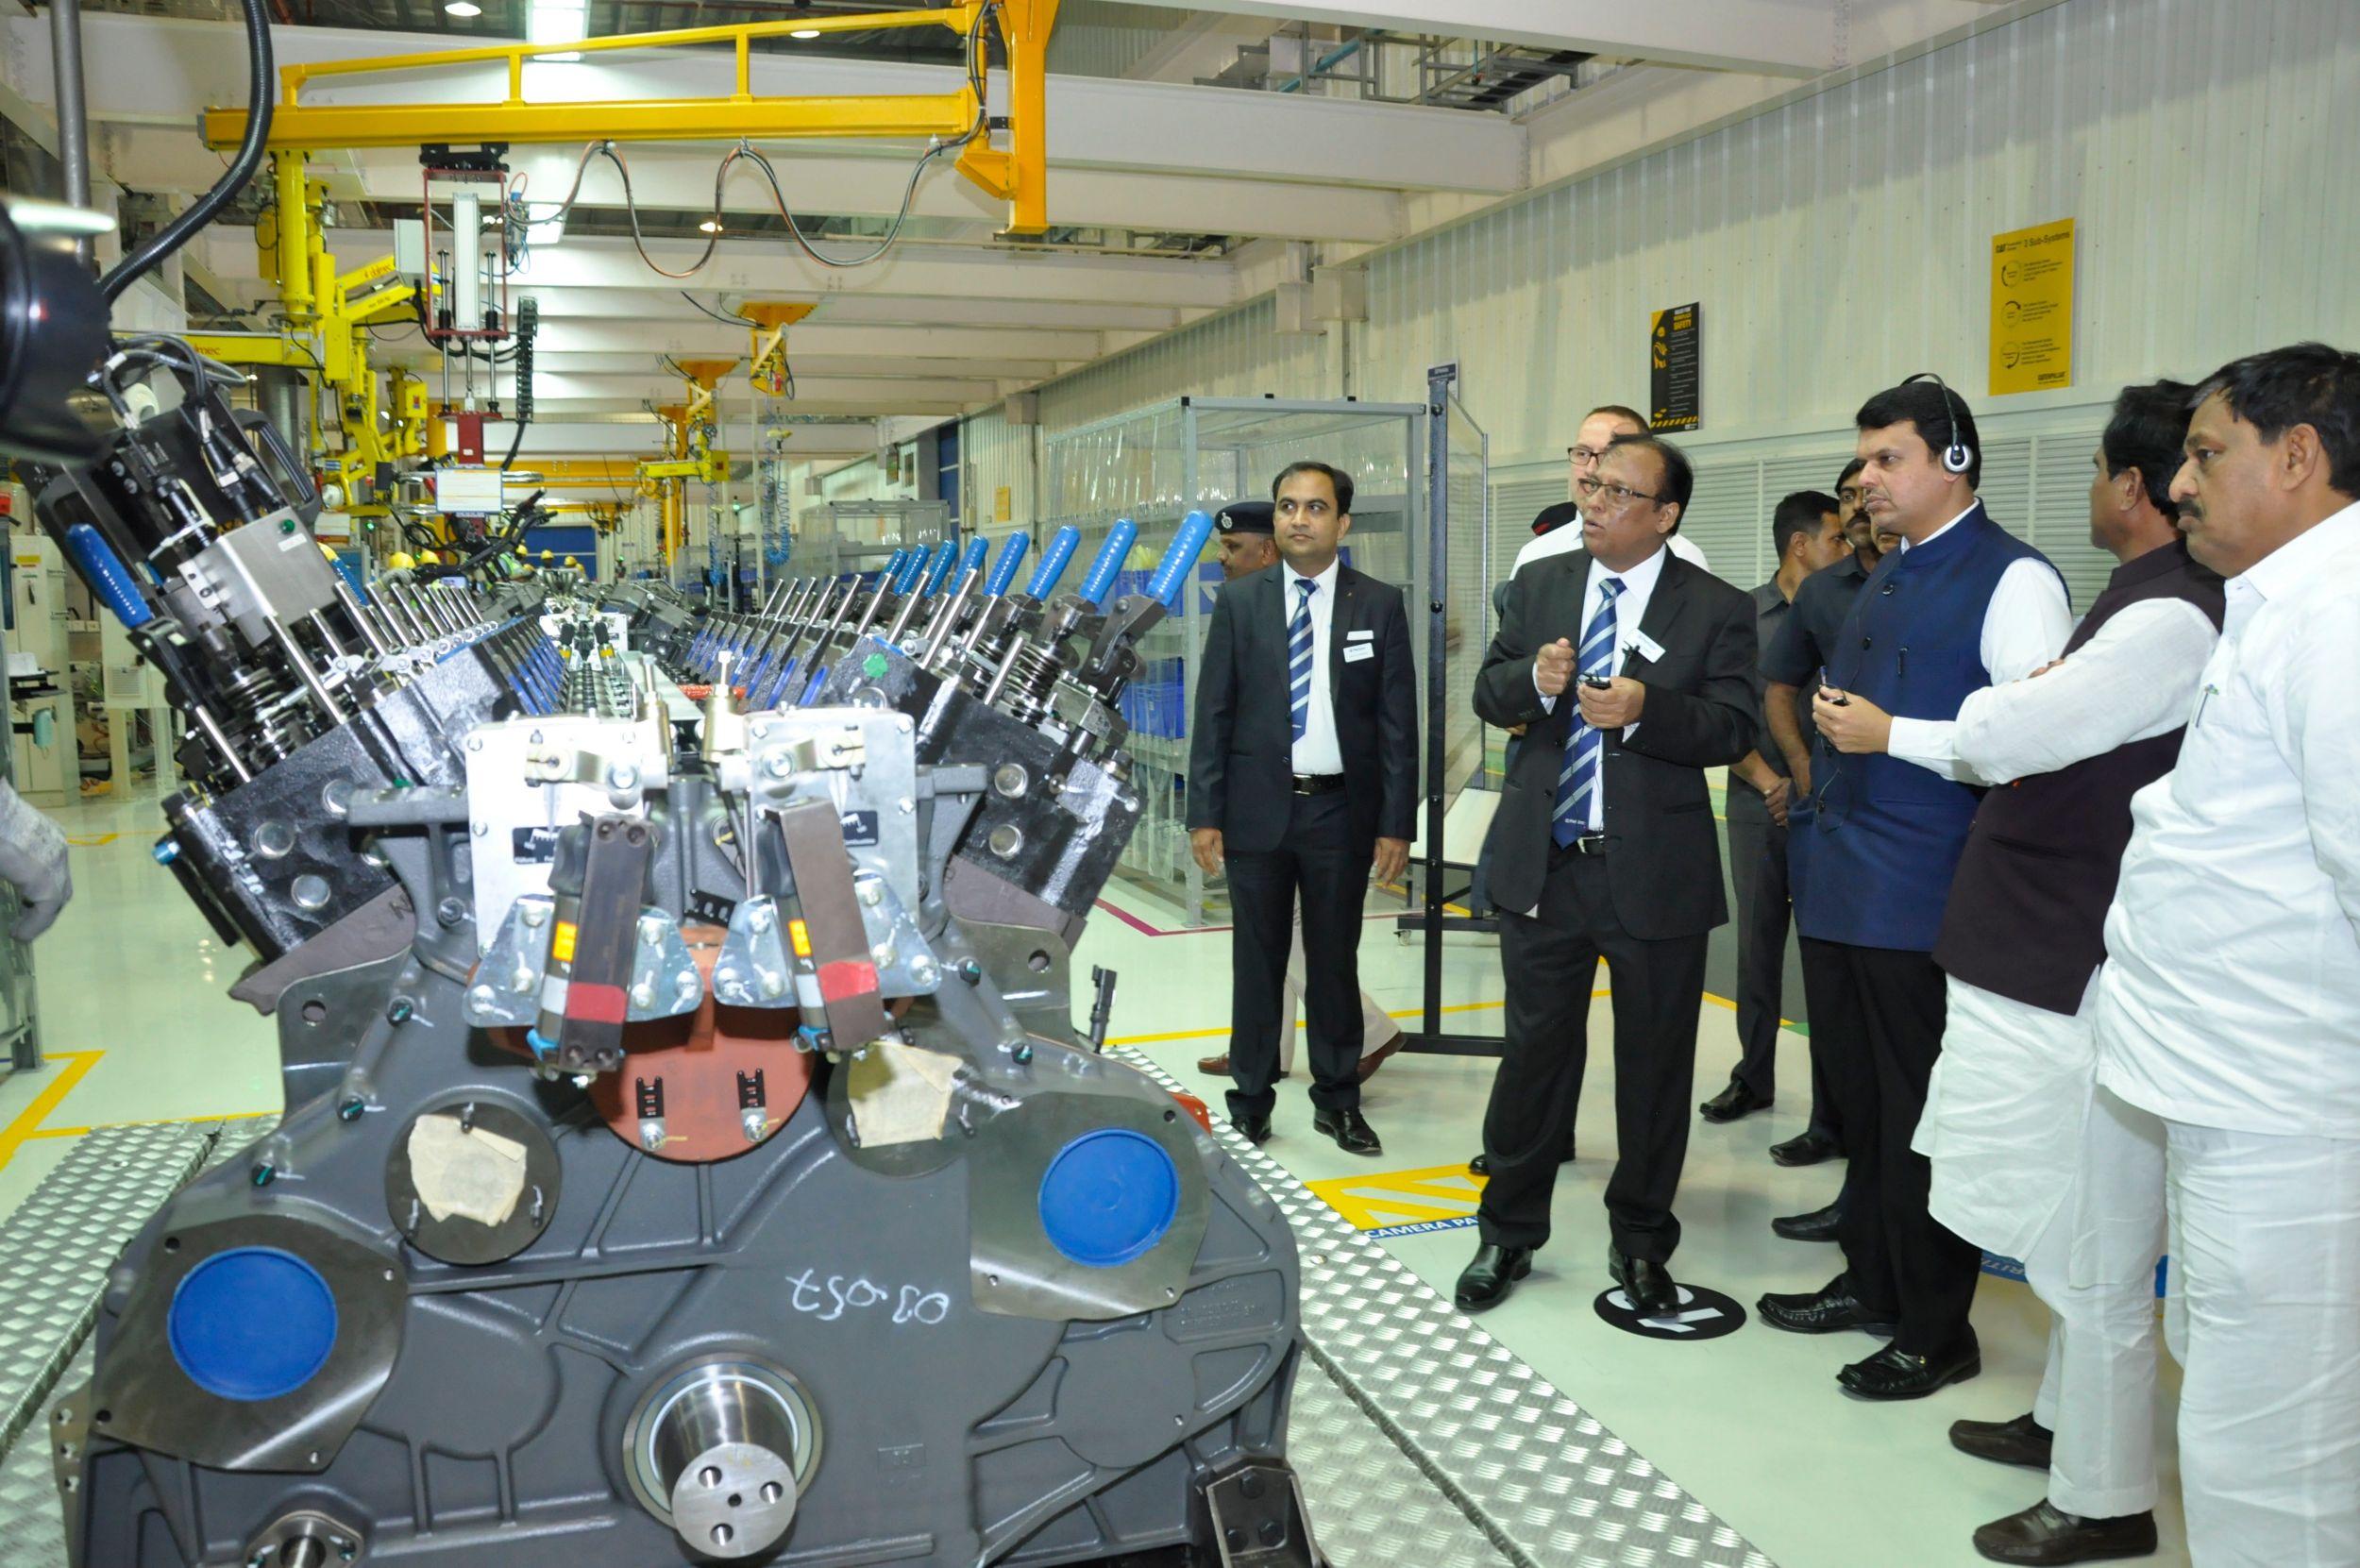 Aurangabad Engine Facility inaugurated by the Chief Minister of Maharashtra